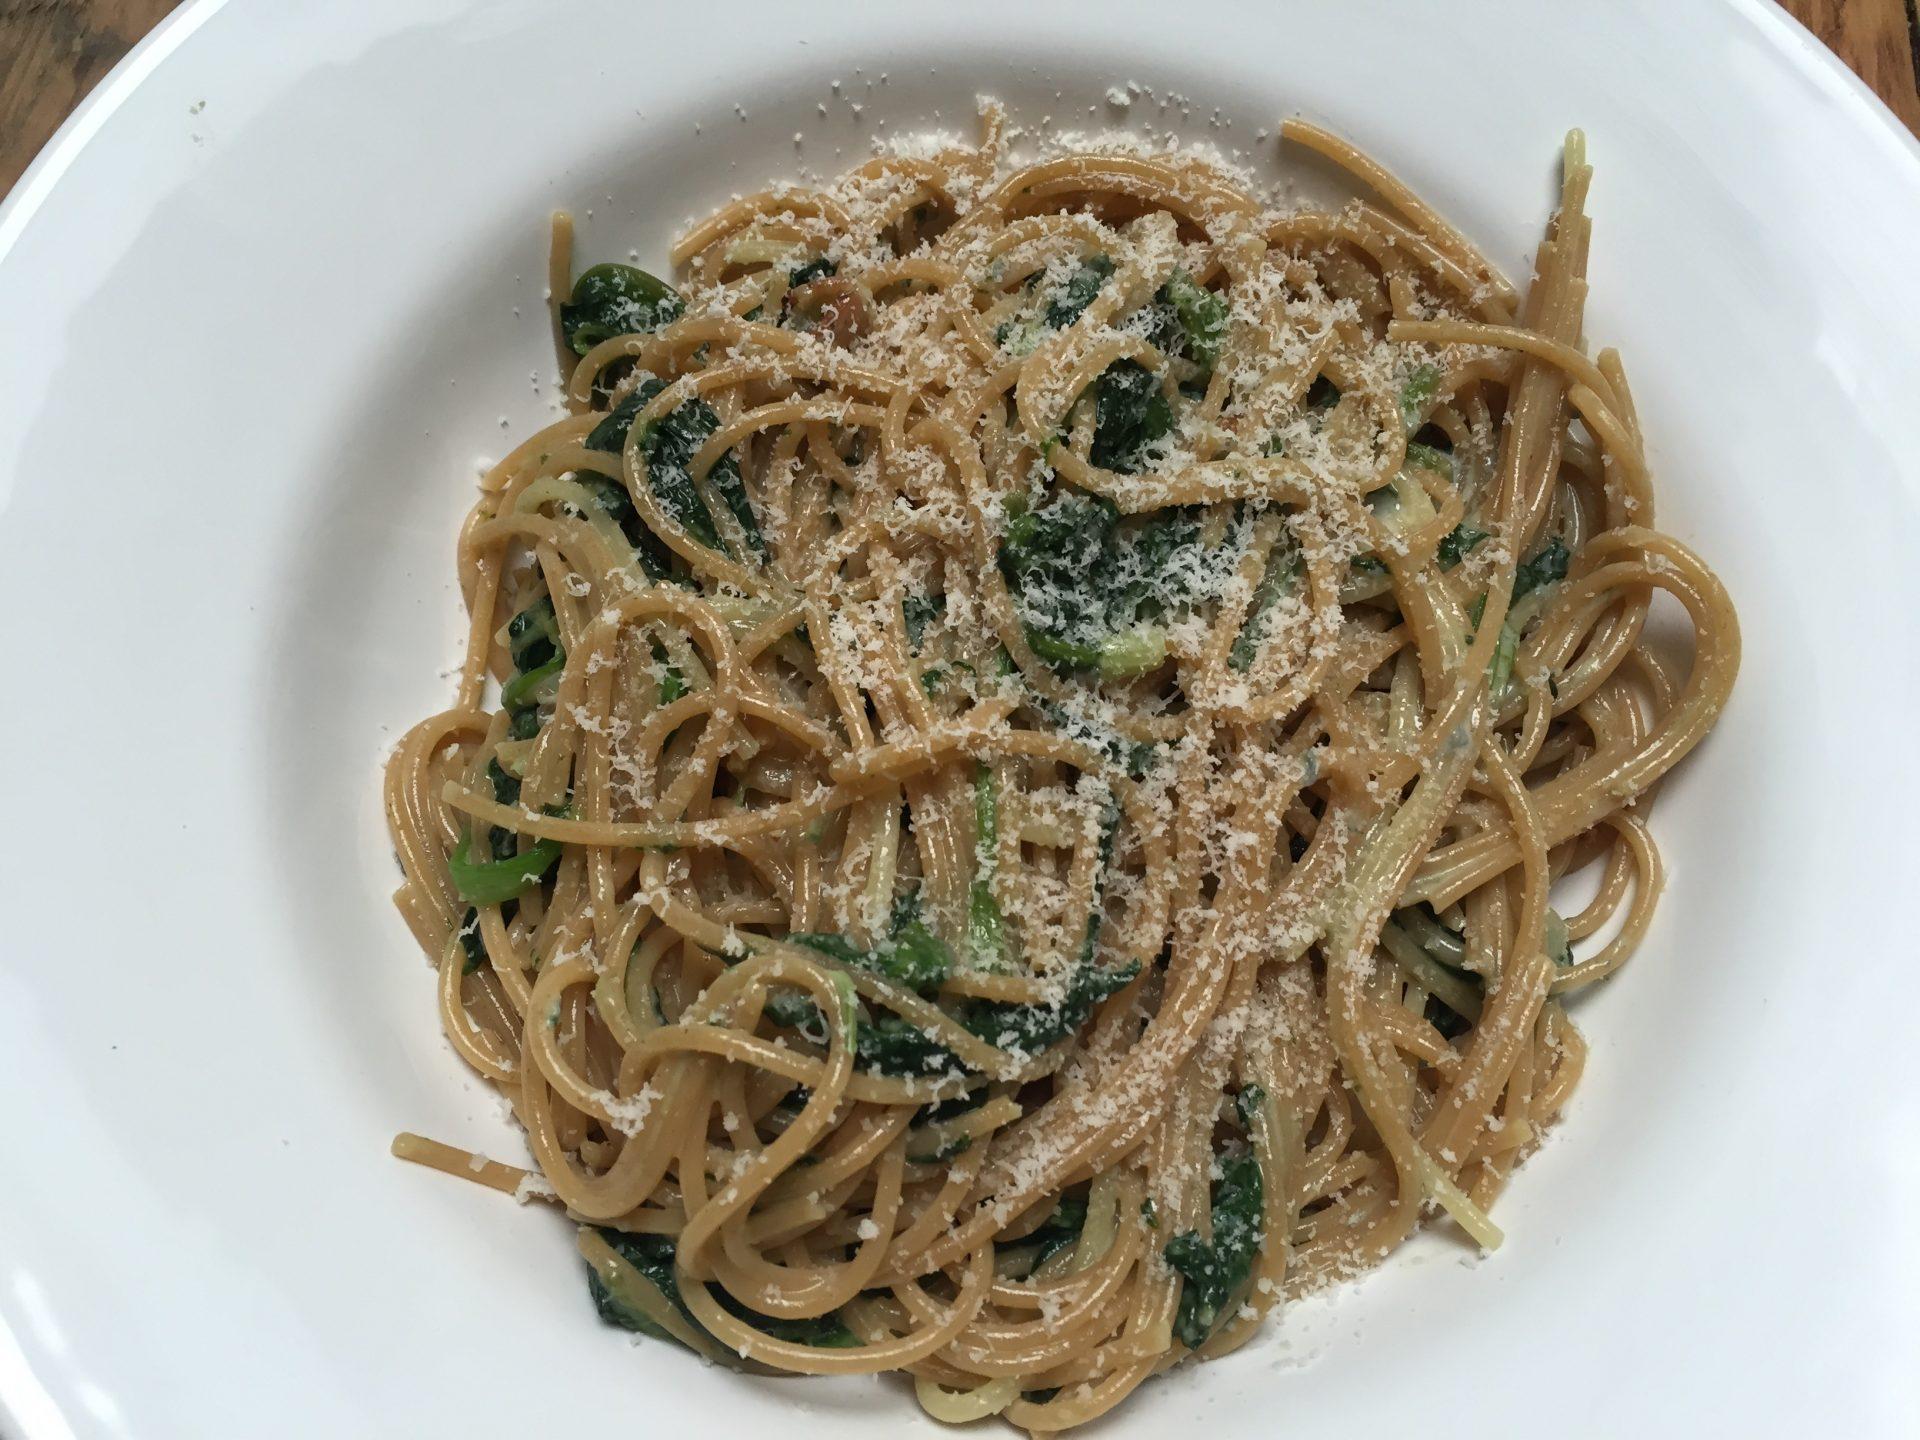 recept voor spaghetti met spinazie en blauwe kaas foodblog Foodinista